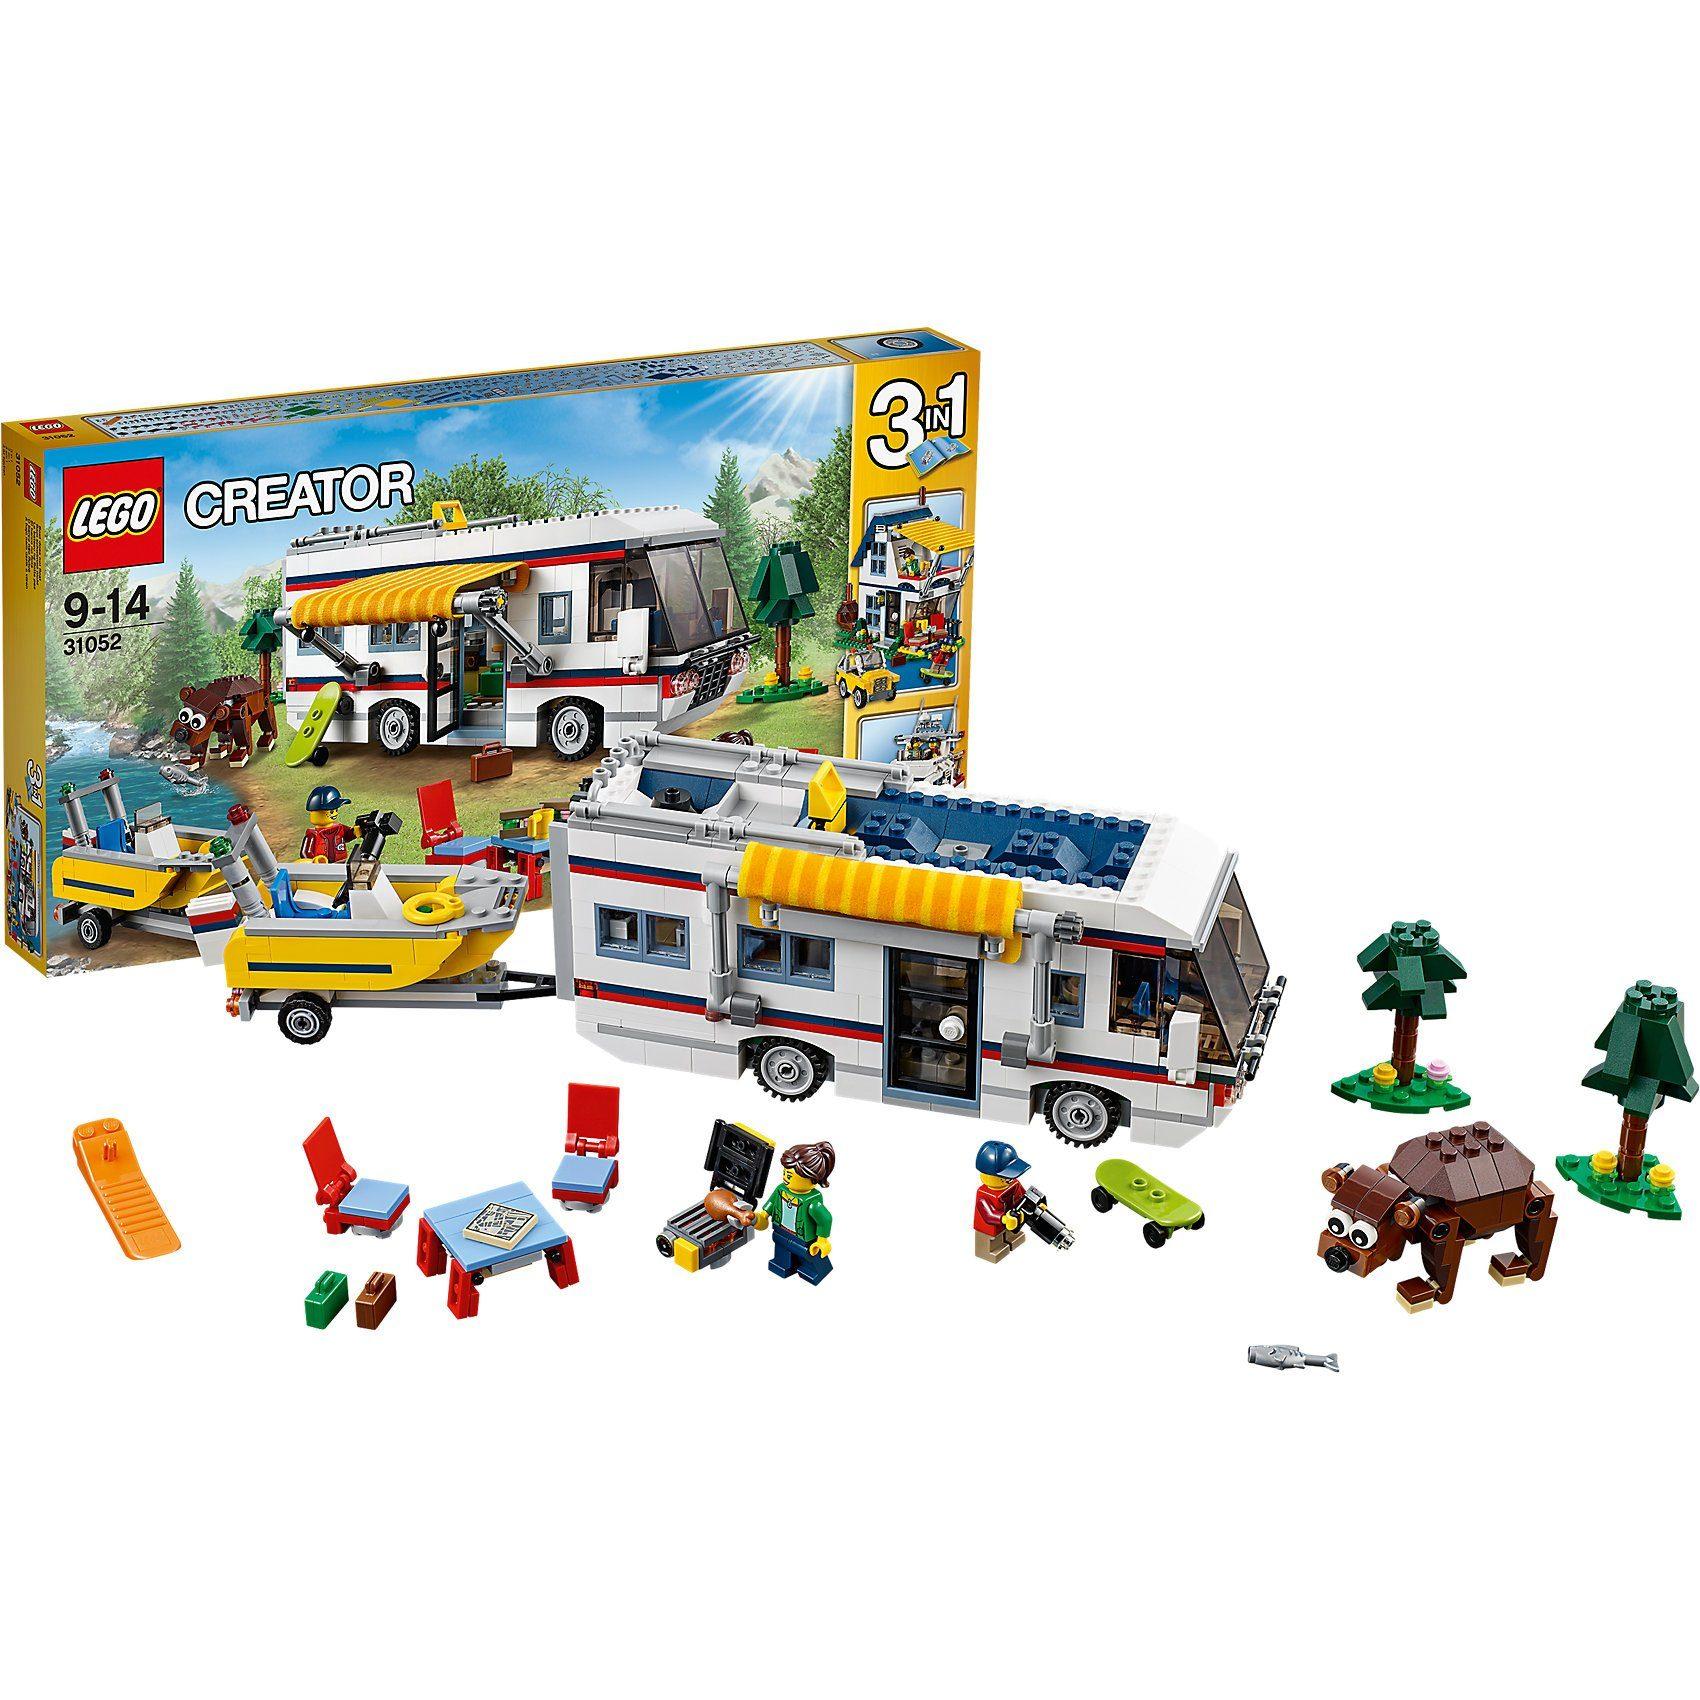 LEGO 31052 Creator: Urlaubsreisen